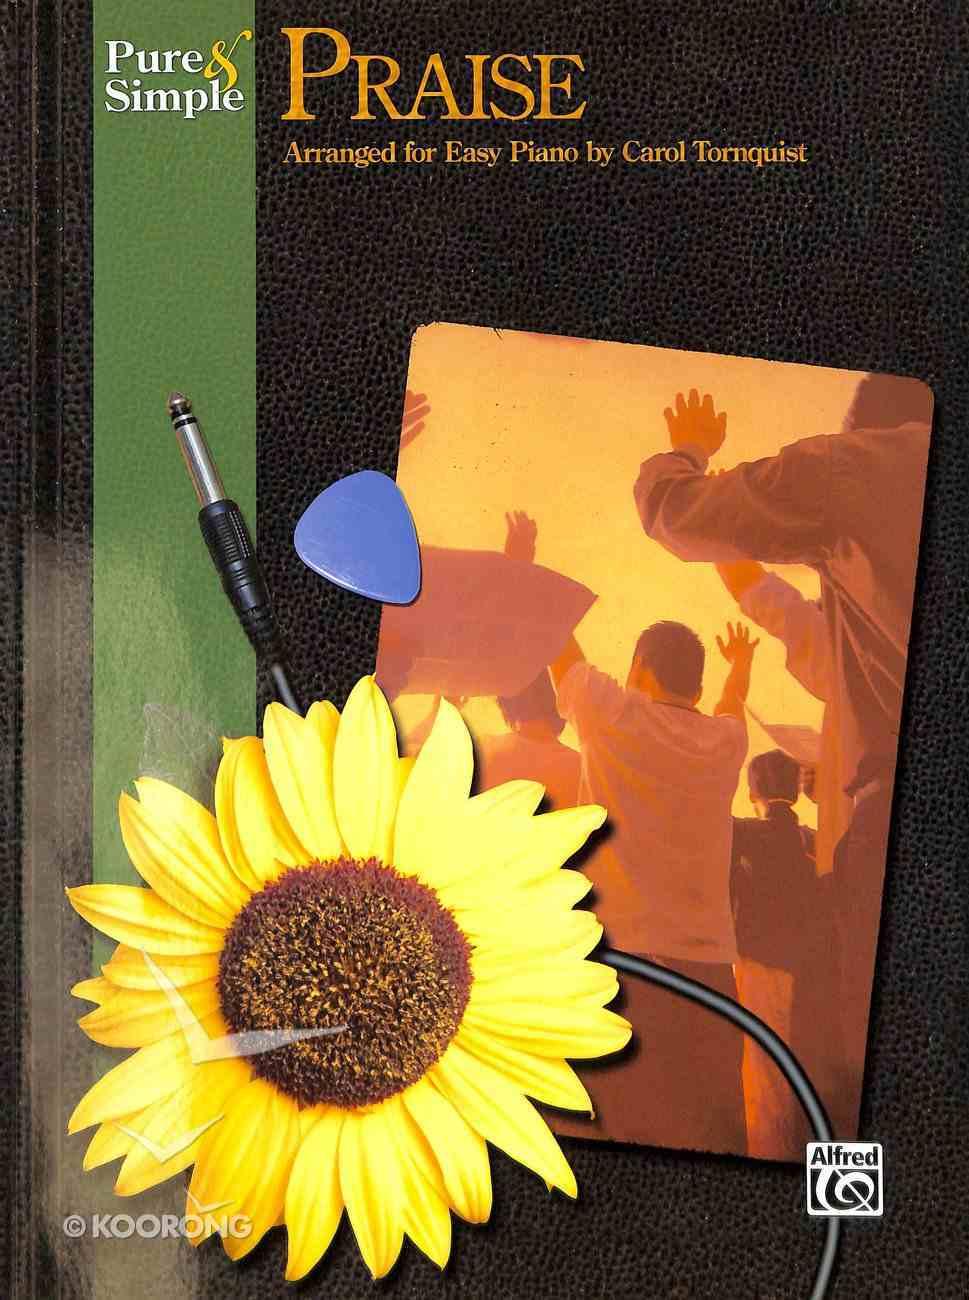 Pure & Simple: Praise (Music Book) Paperback